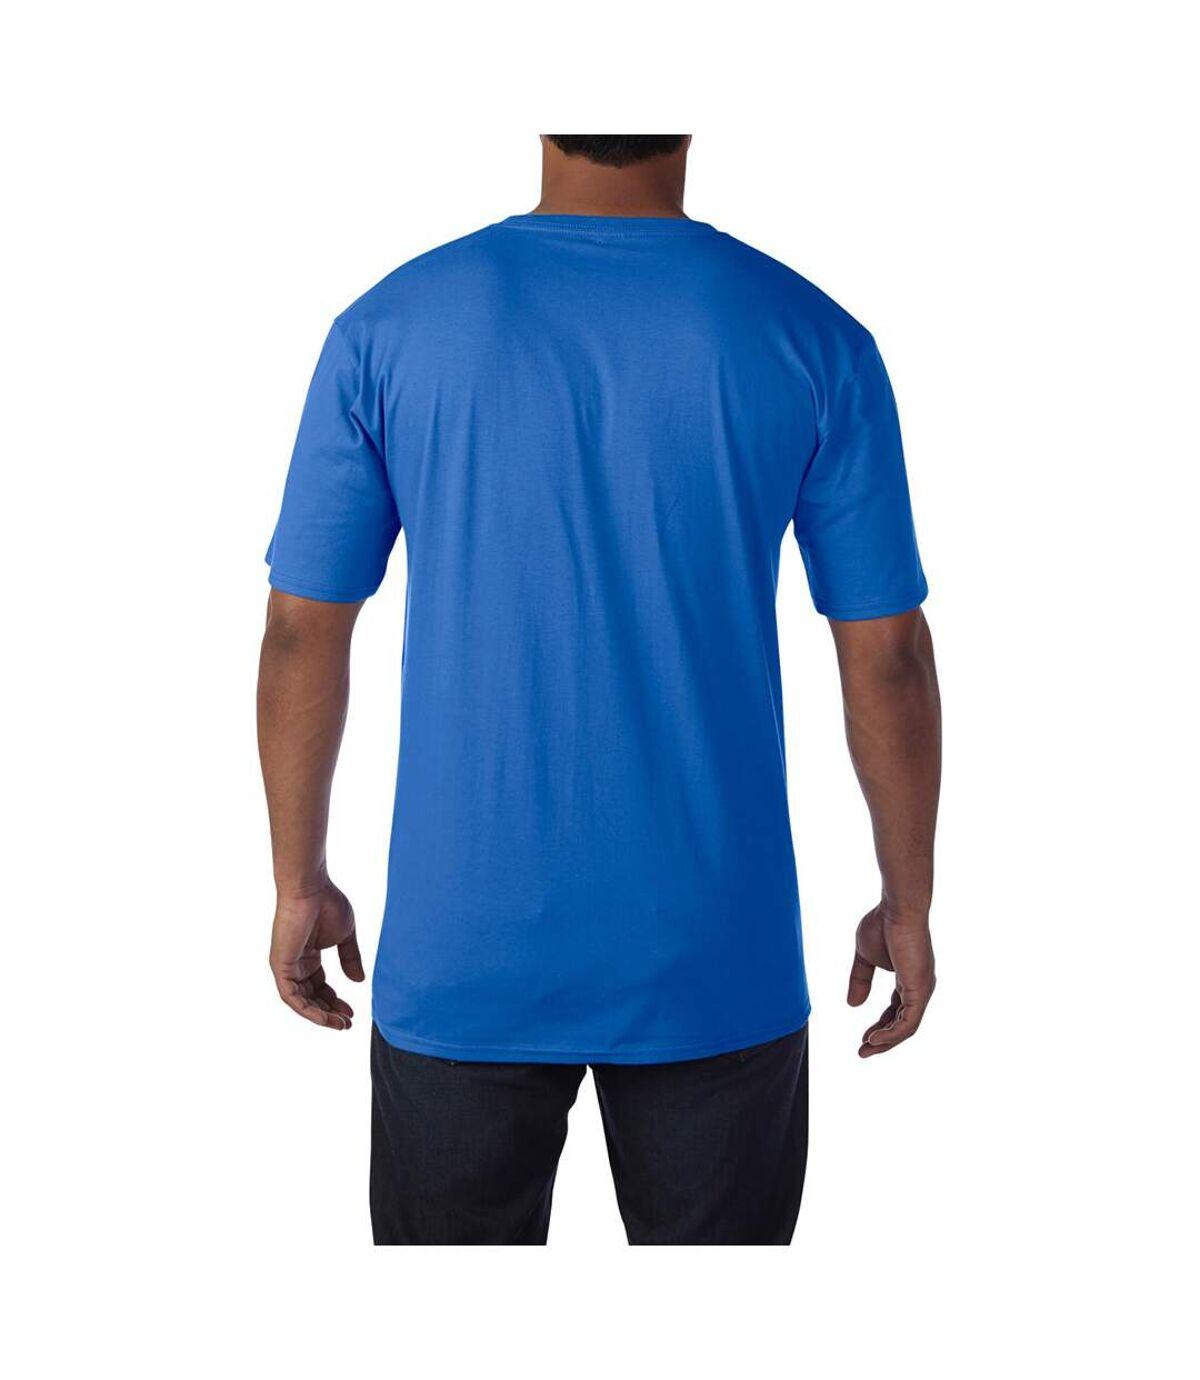 Gildan Mens Premium Cotton V Neck Short Sleeve T-Shirt (Royal) - UTBC3483